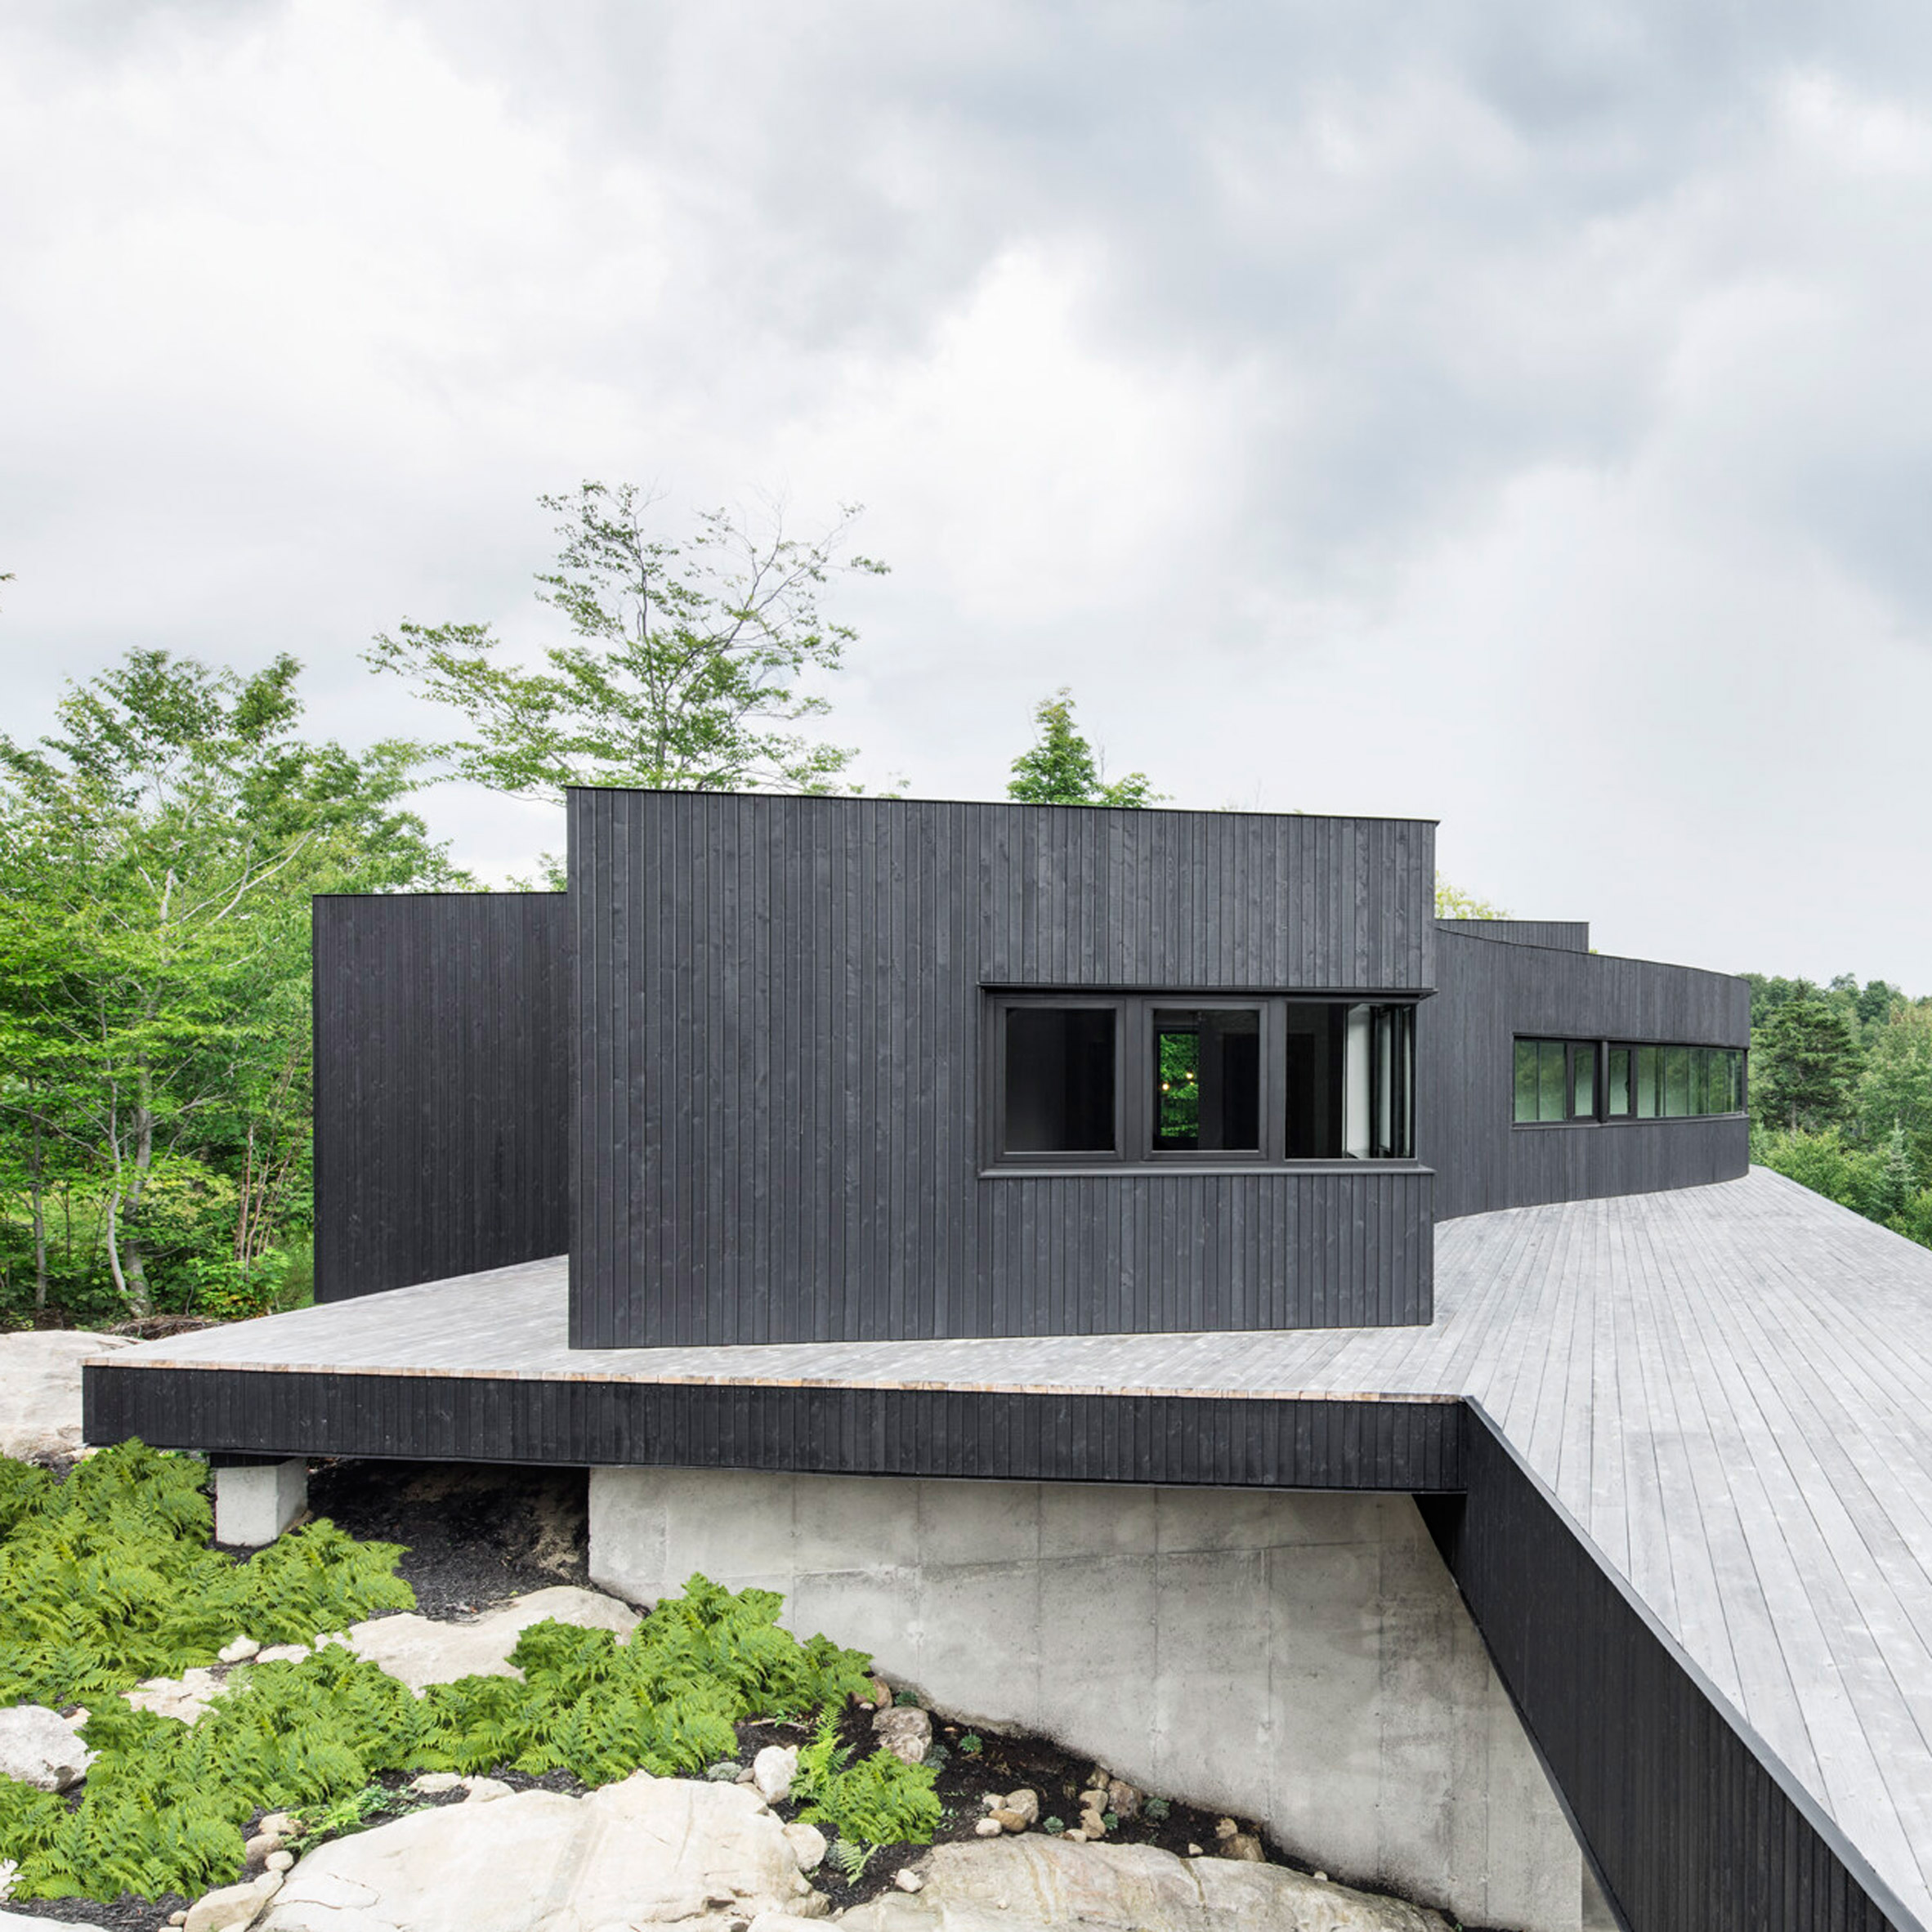 La heronniere by alain carle interior design jobs quebec for Interior design jobs in europe